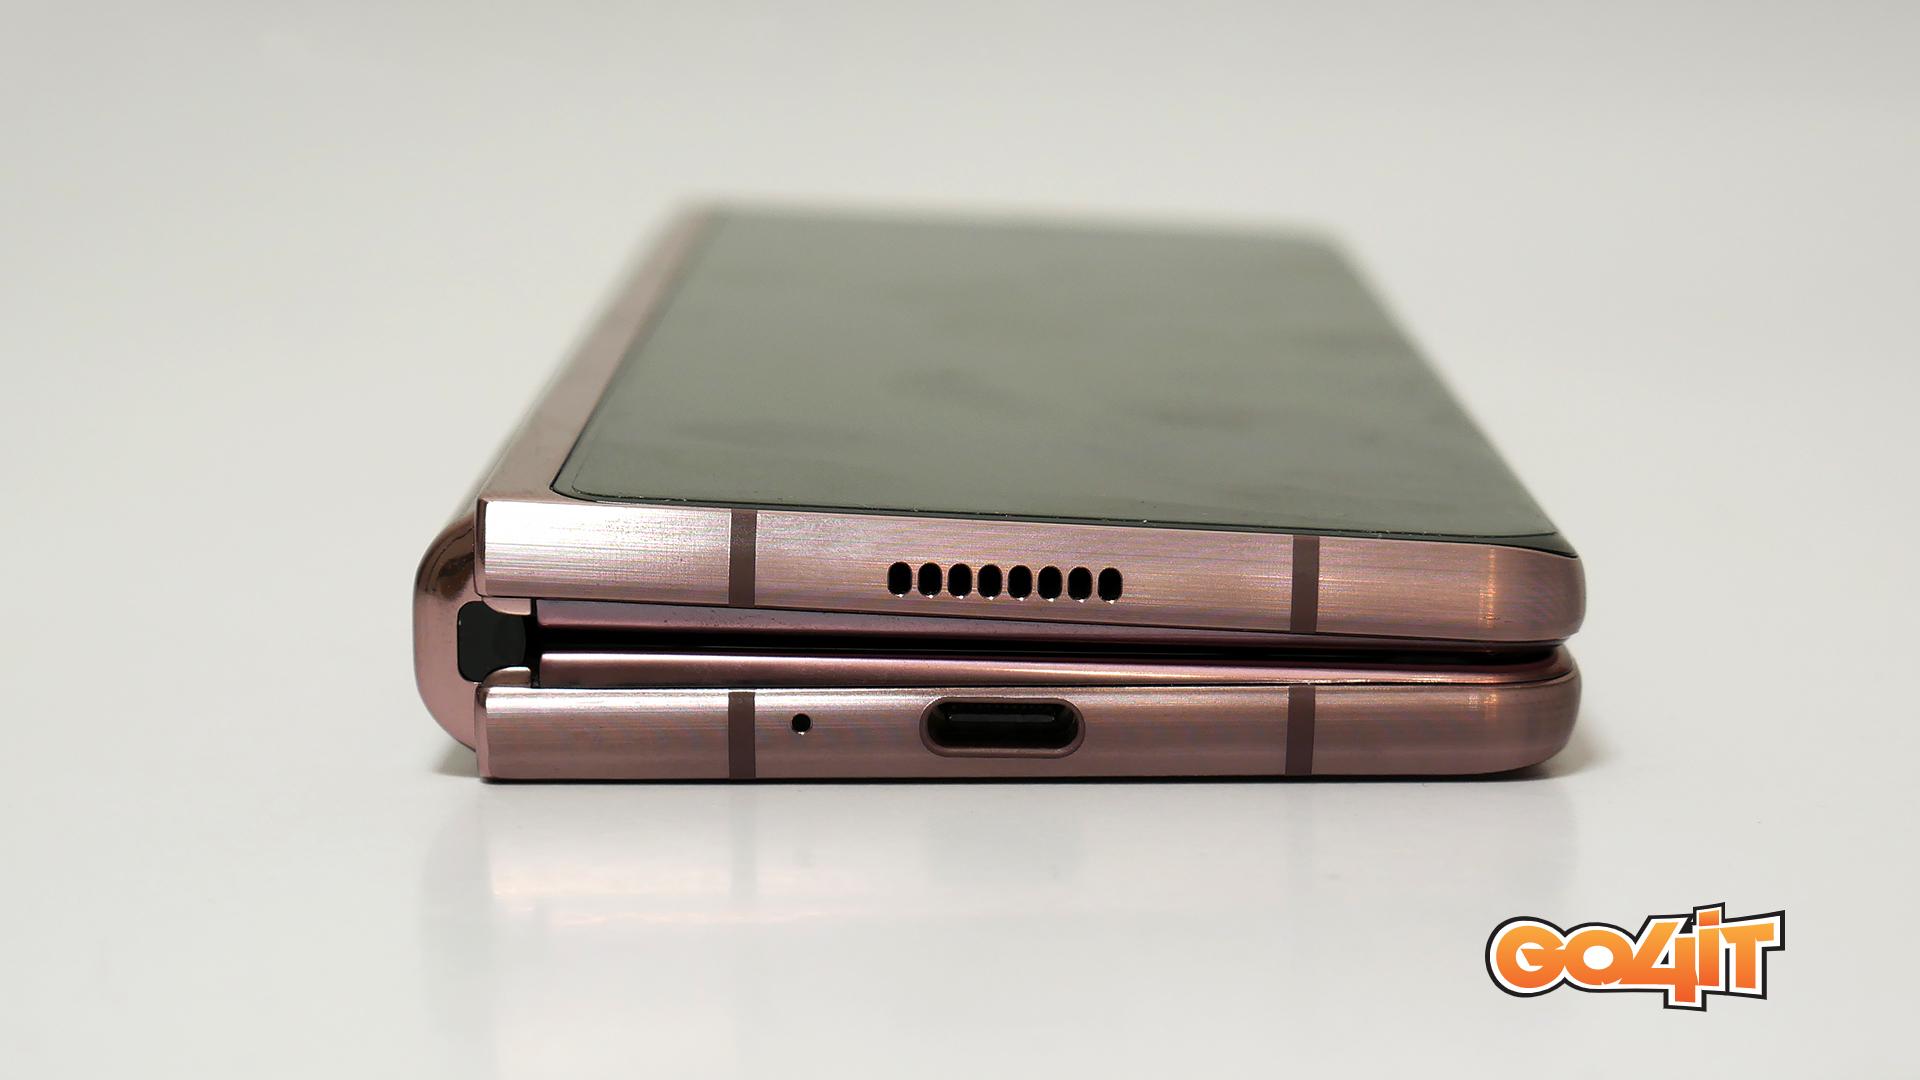 Samsung Galaxy Z Fold2 bottom port